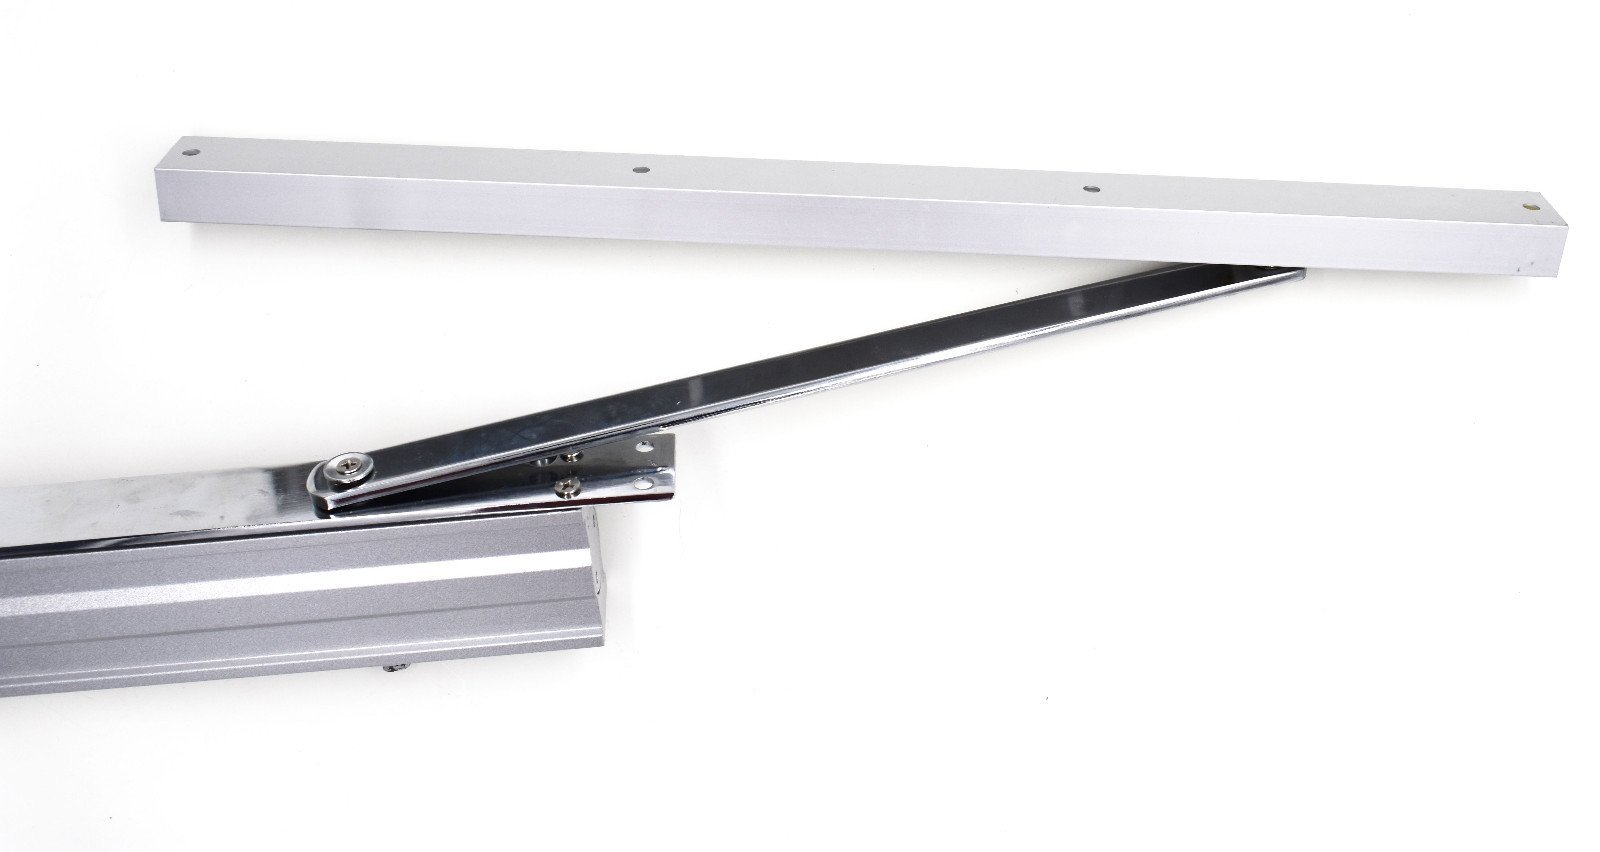 Kerui Furniture Hardware automatic door closer price square triangel door